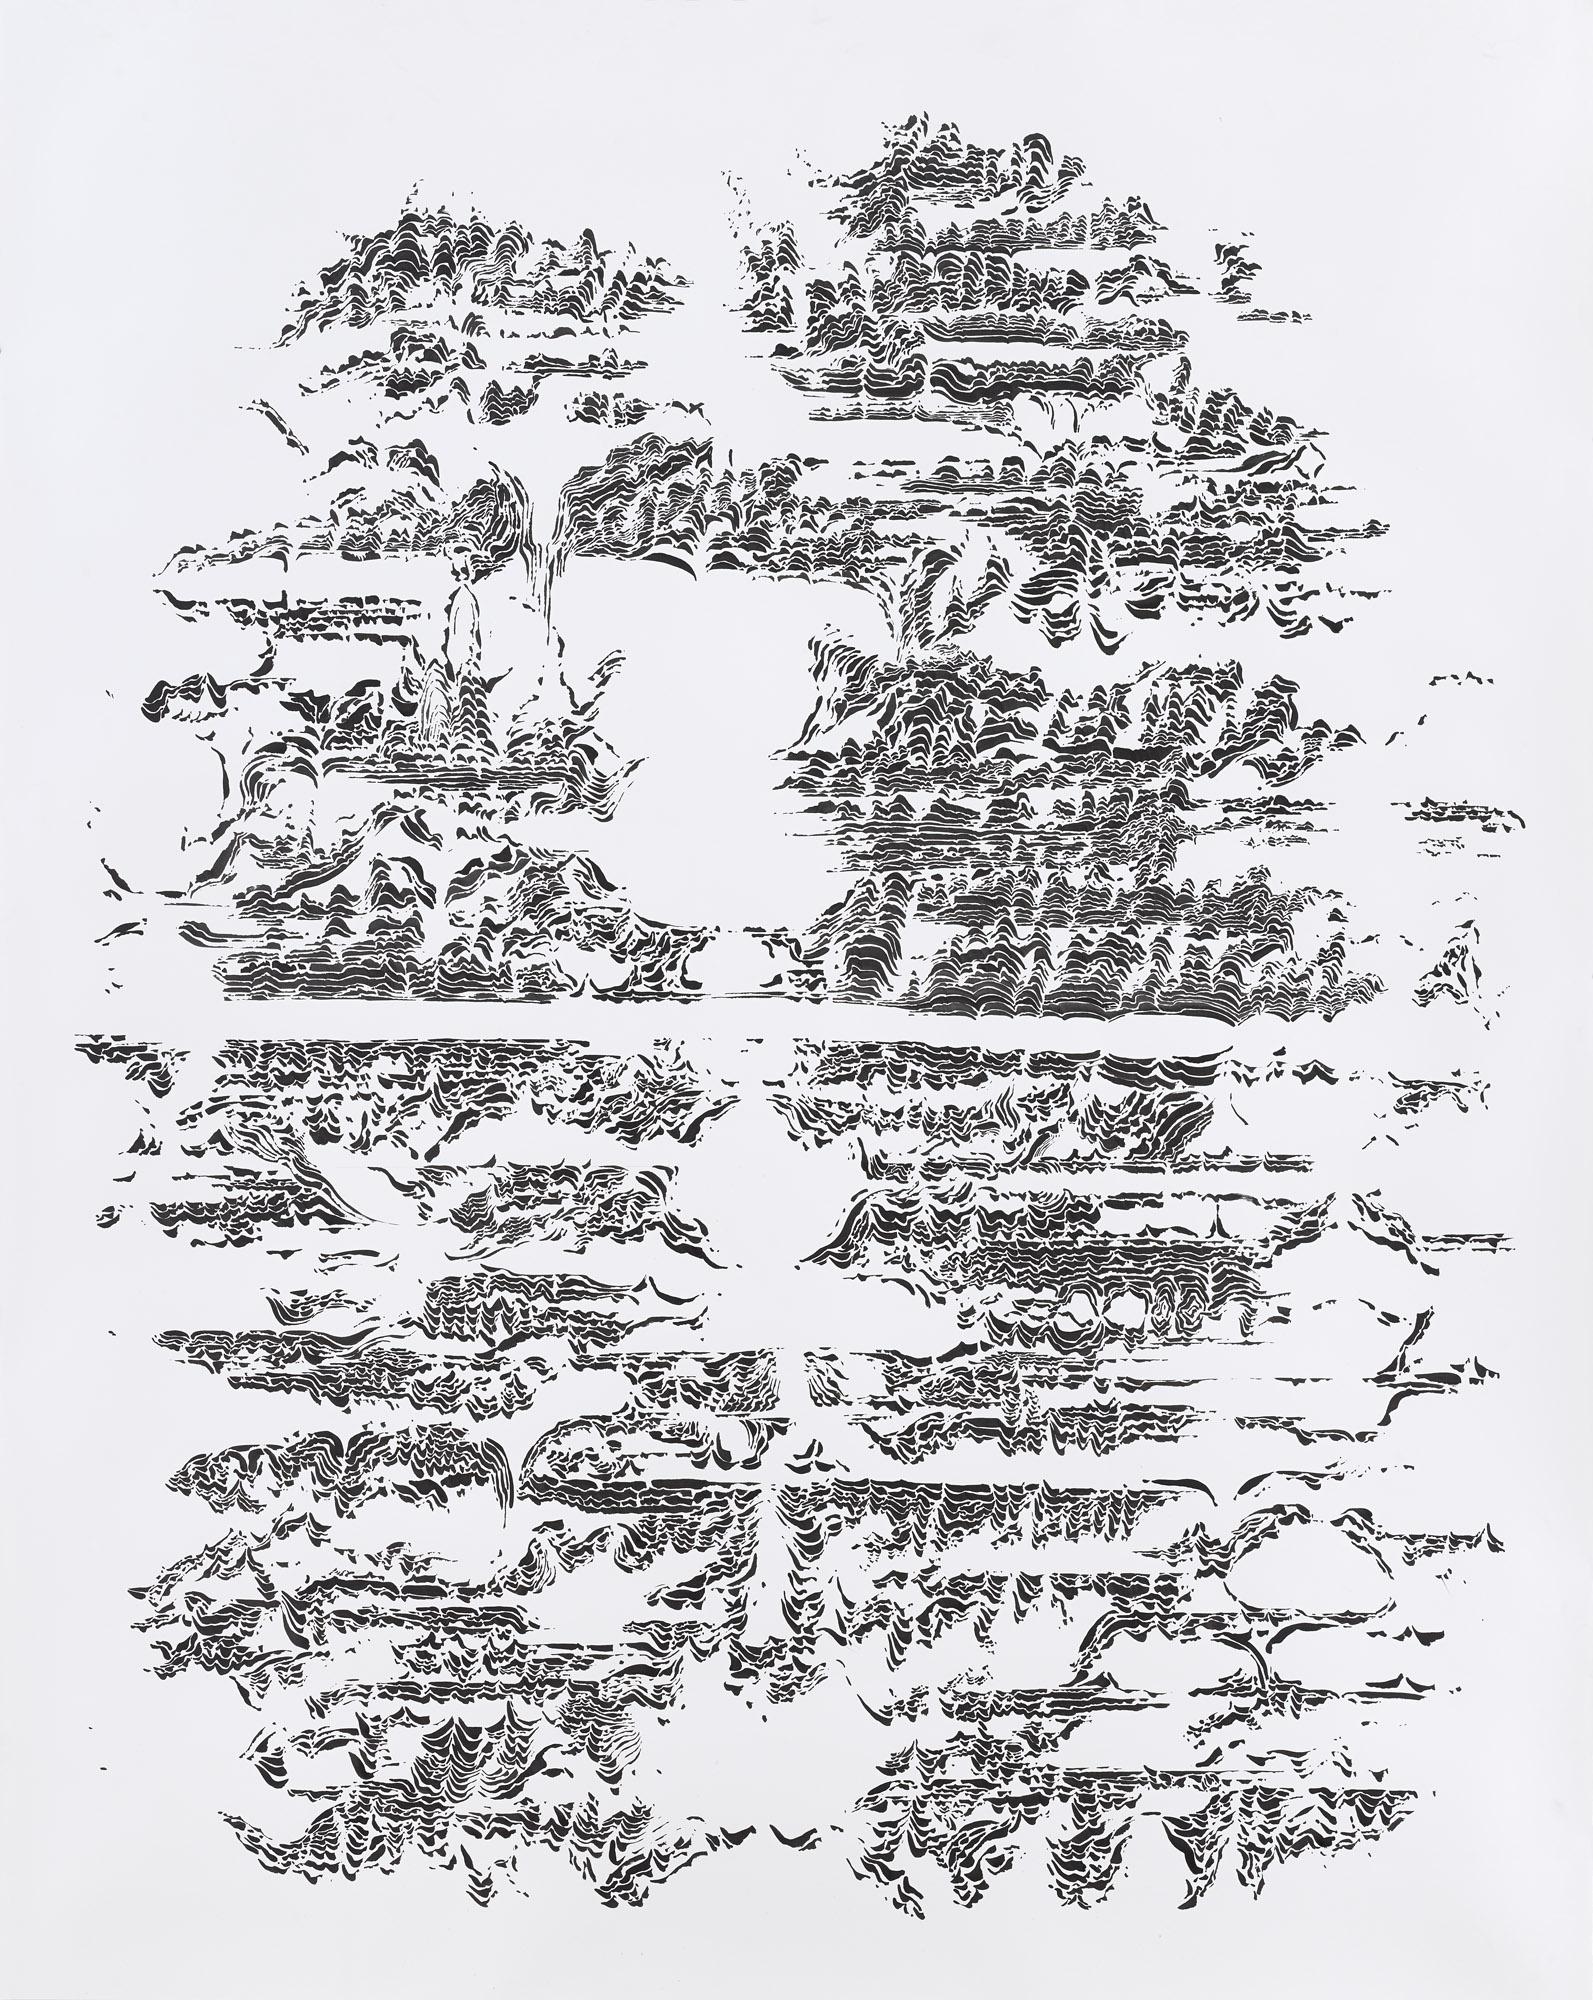 BK P7438 | untitled | ink on paper | 200x150cm | 2015